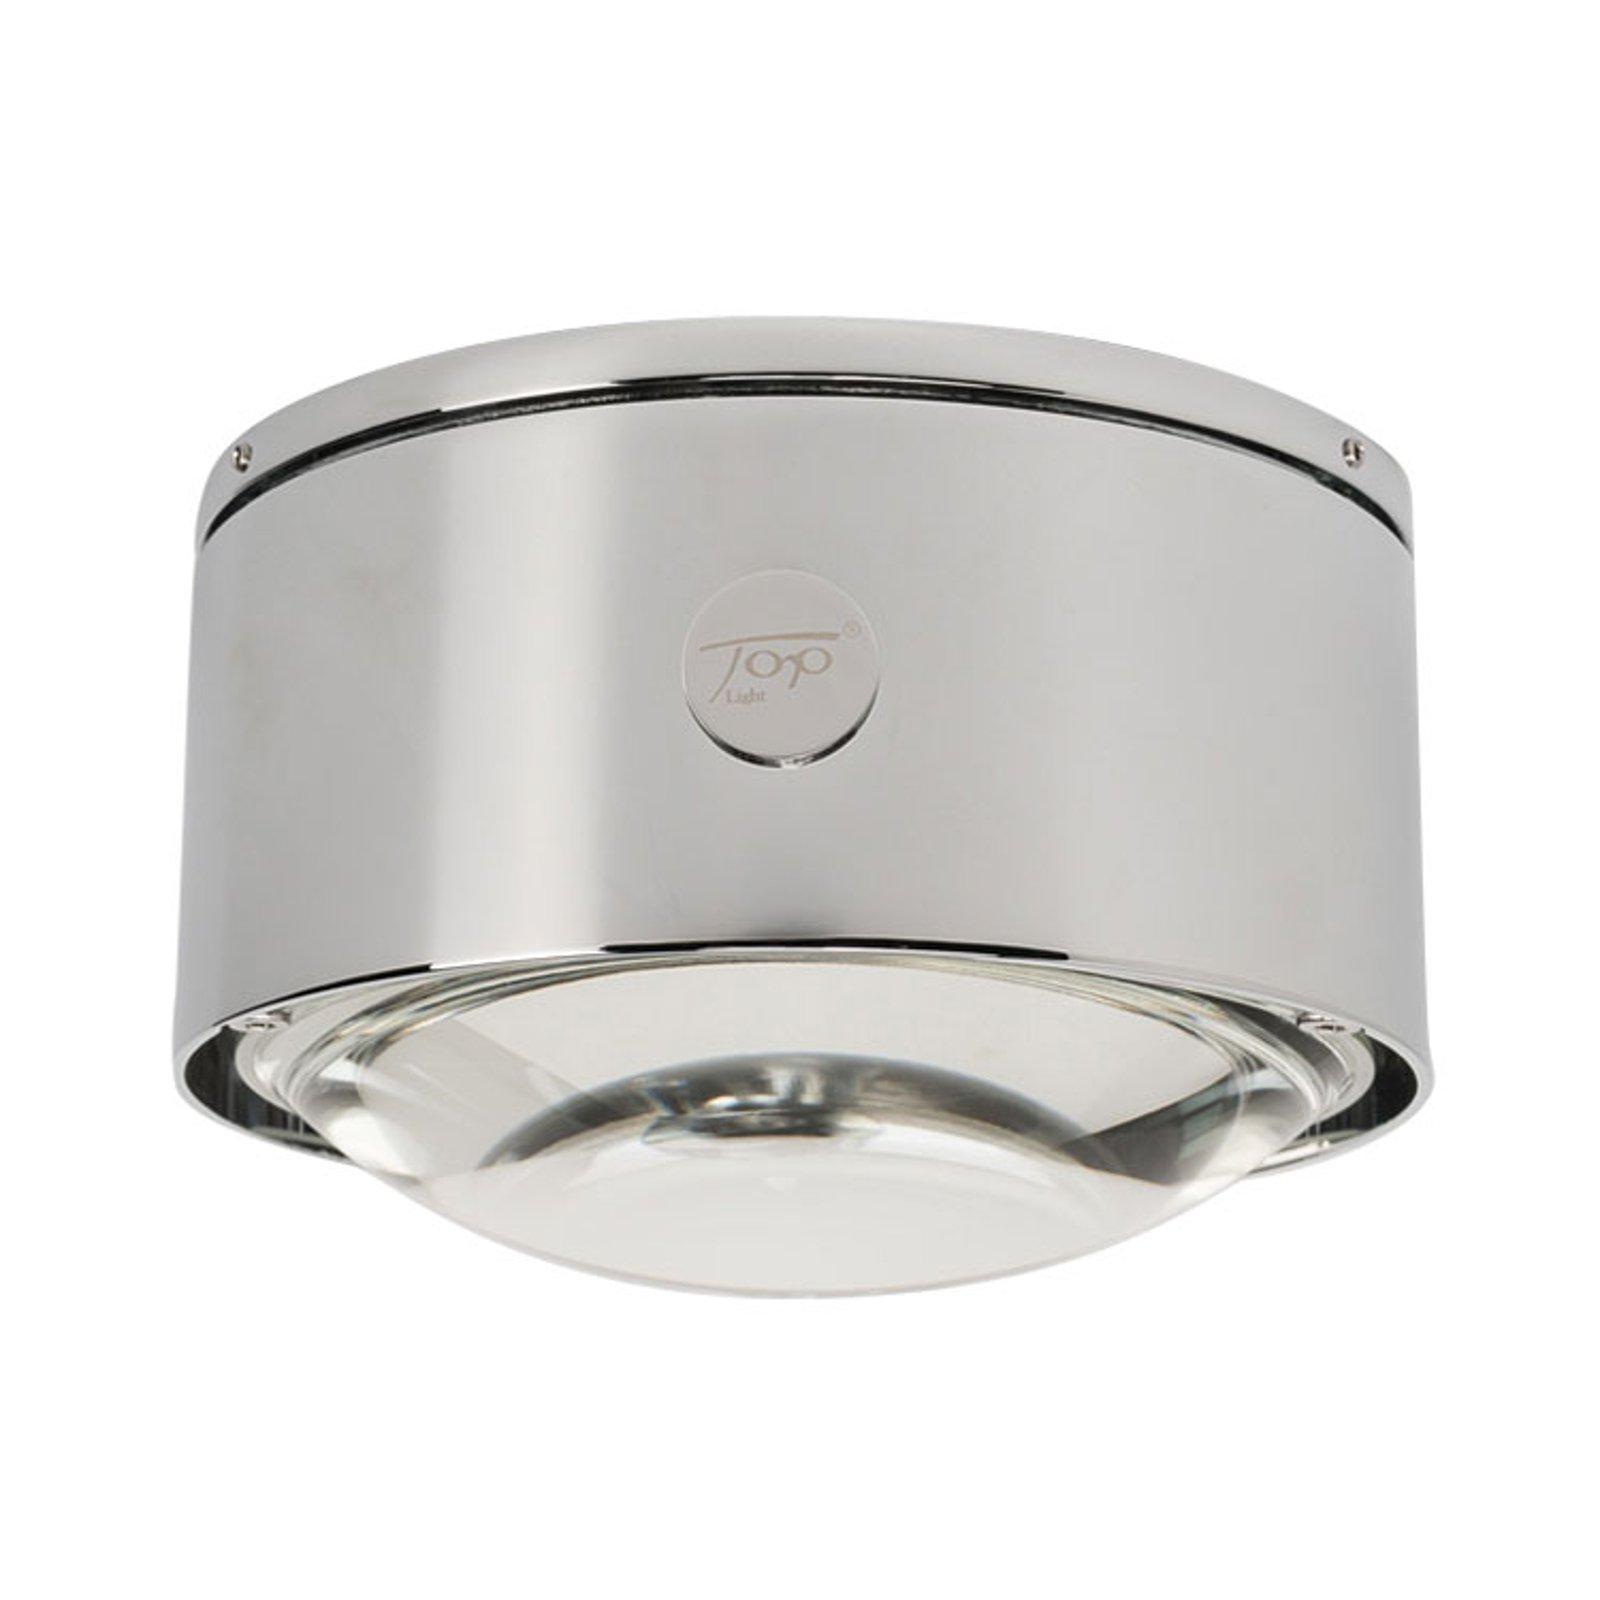 LED-taklampe Puk Maxx One 2, krom matt